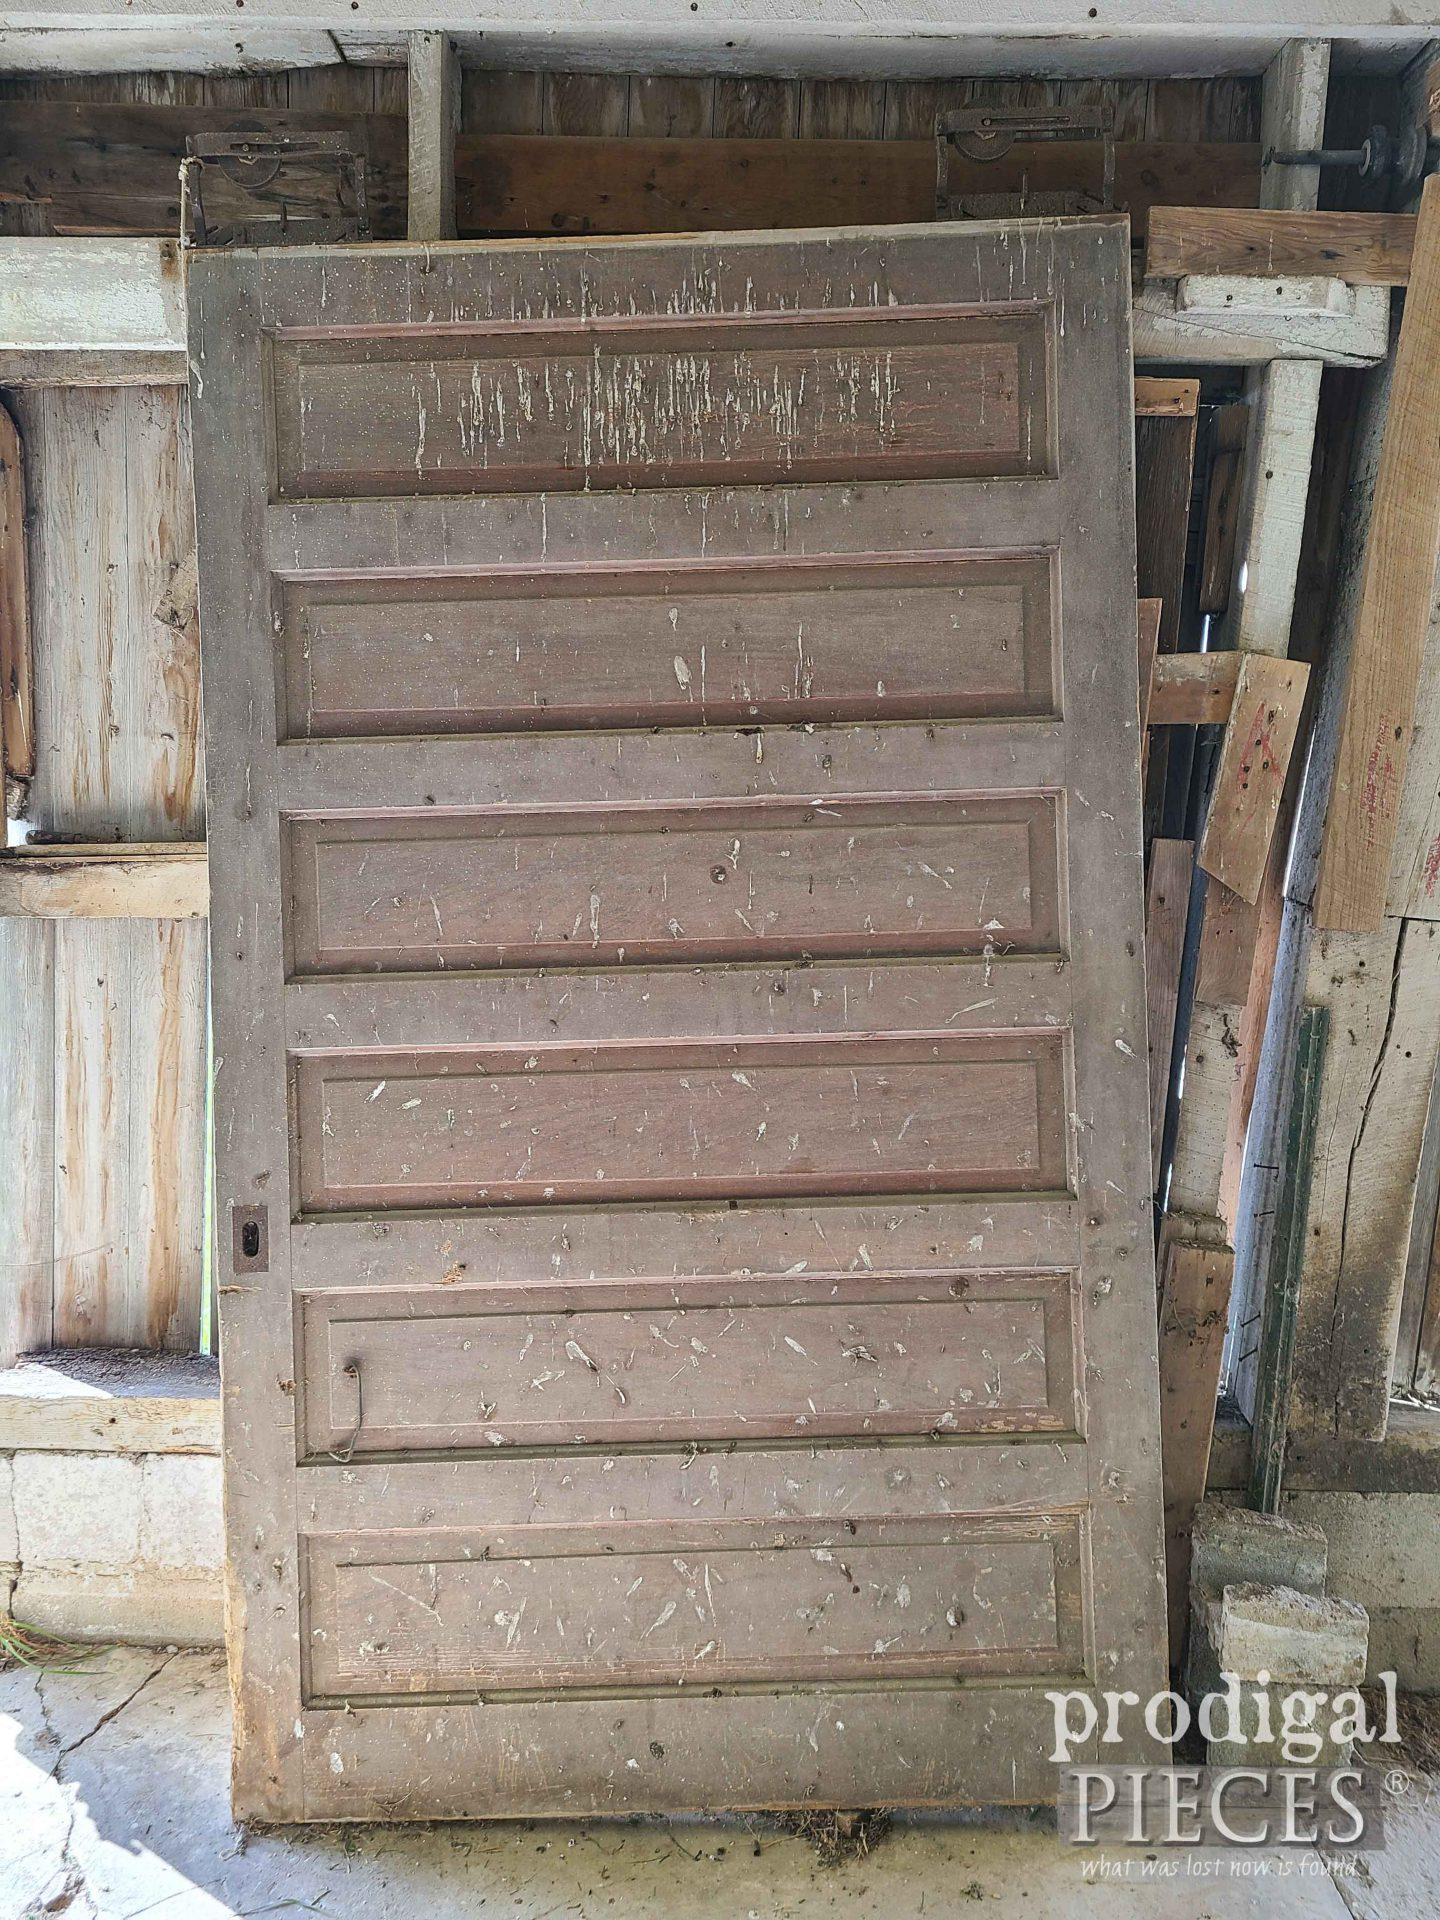 Antlque Sliding Barn Door | prodigalpieces.com